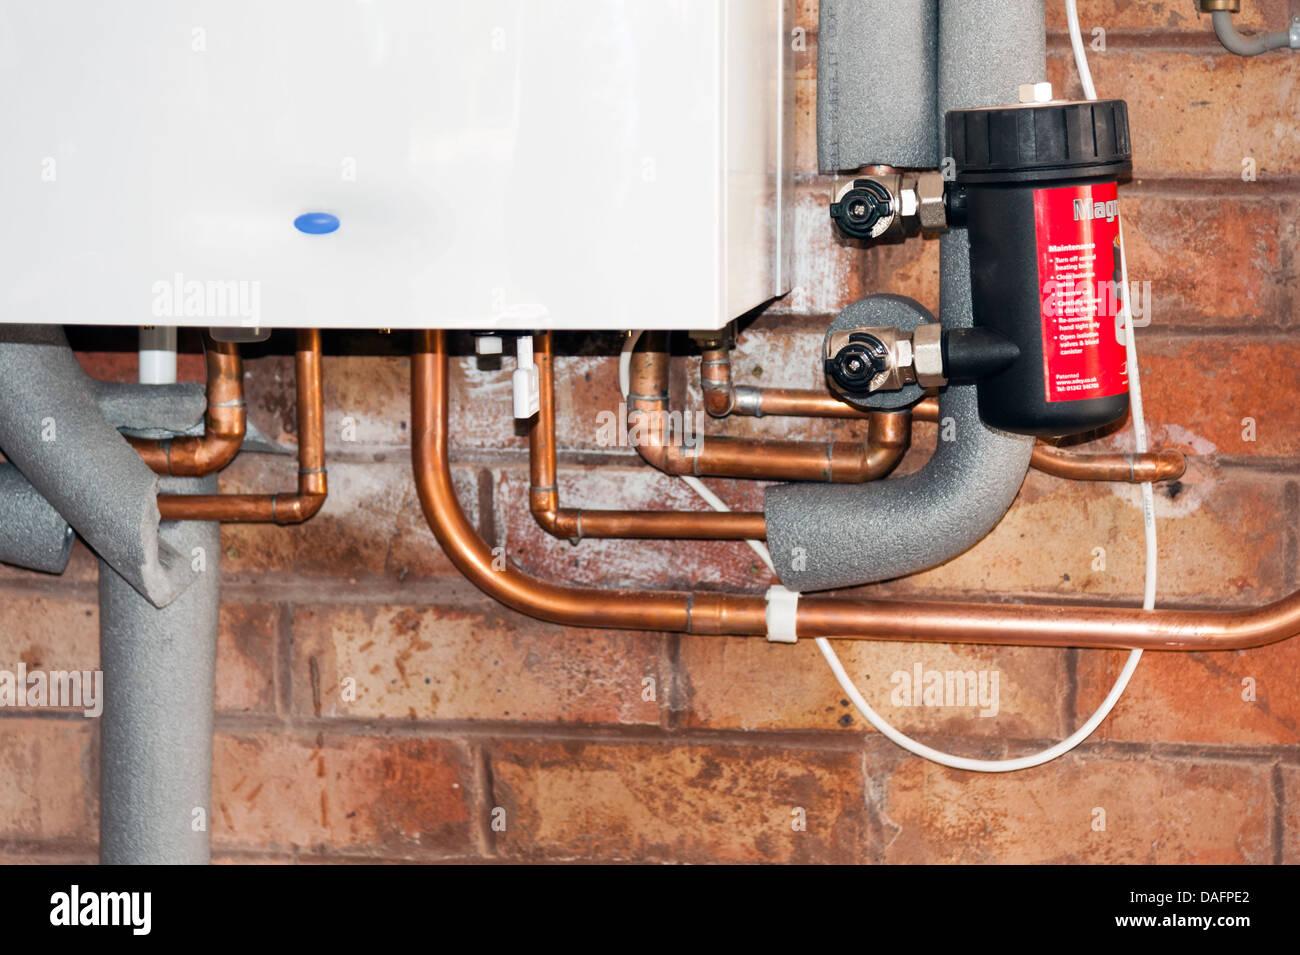 Combi Boiler Stockfotos & Combi Boiler Bilder - Alamy